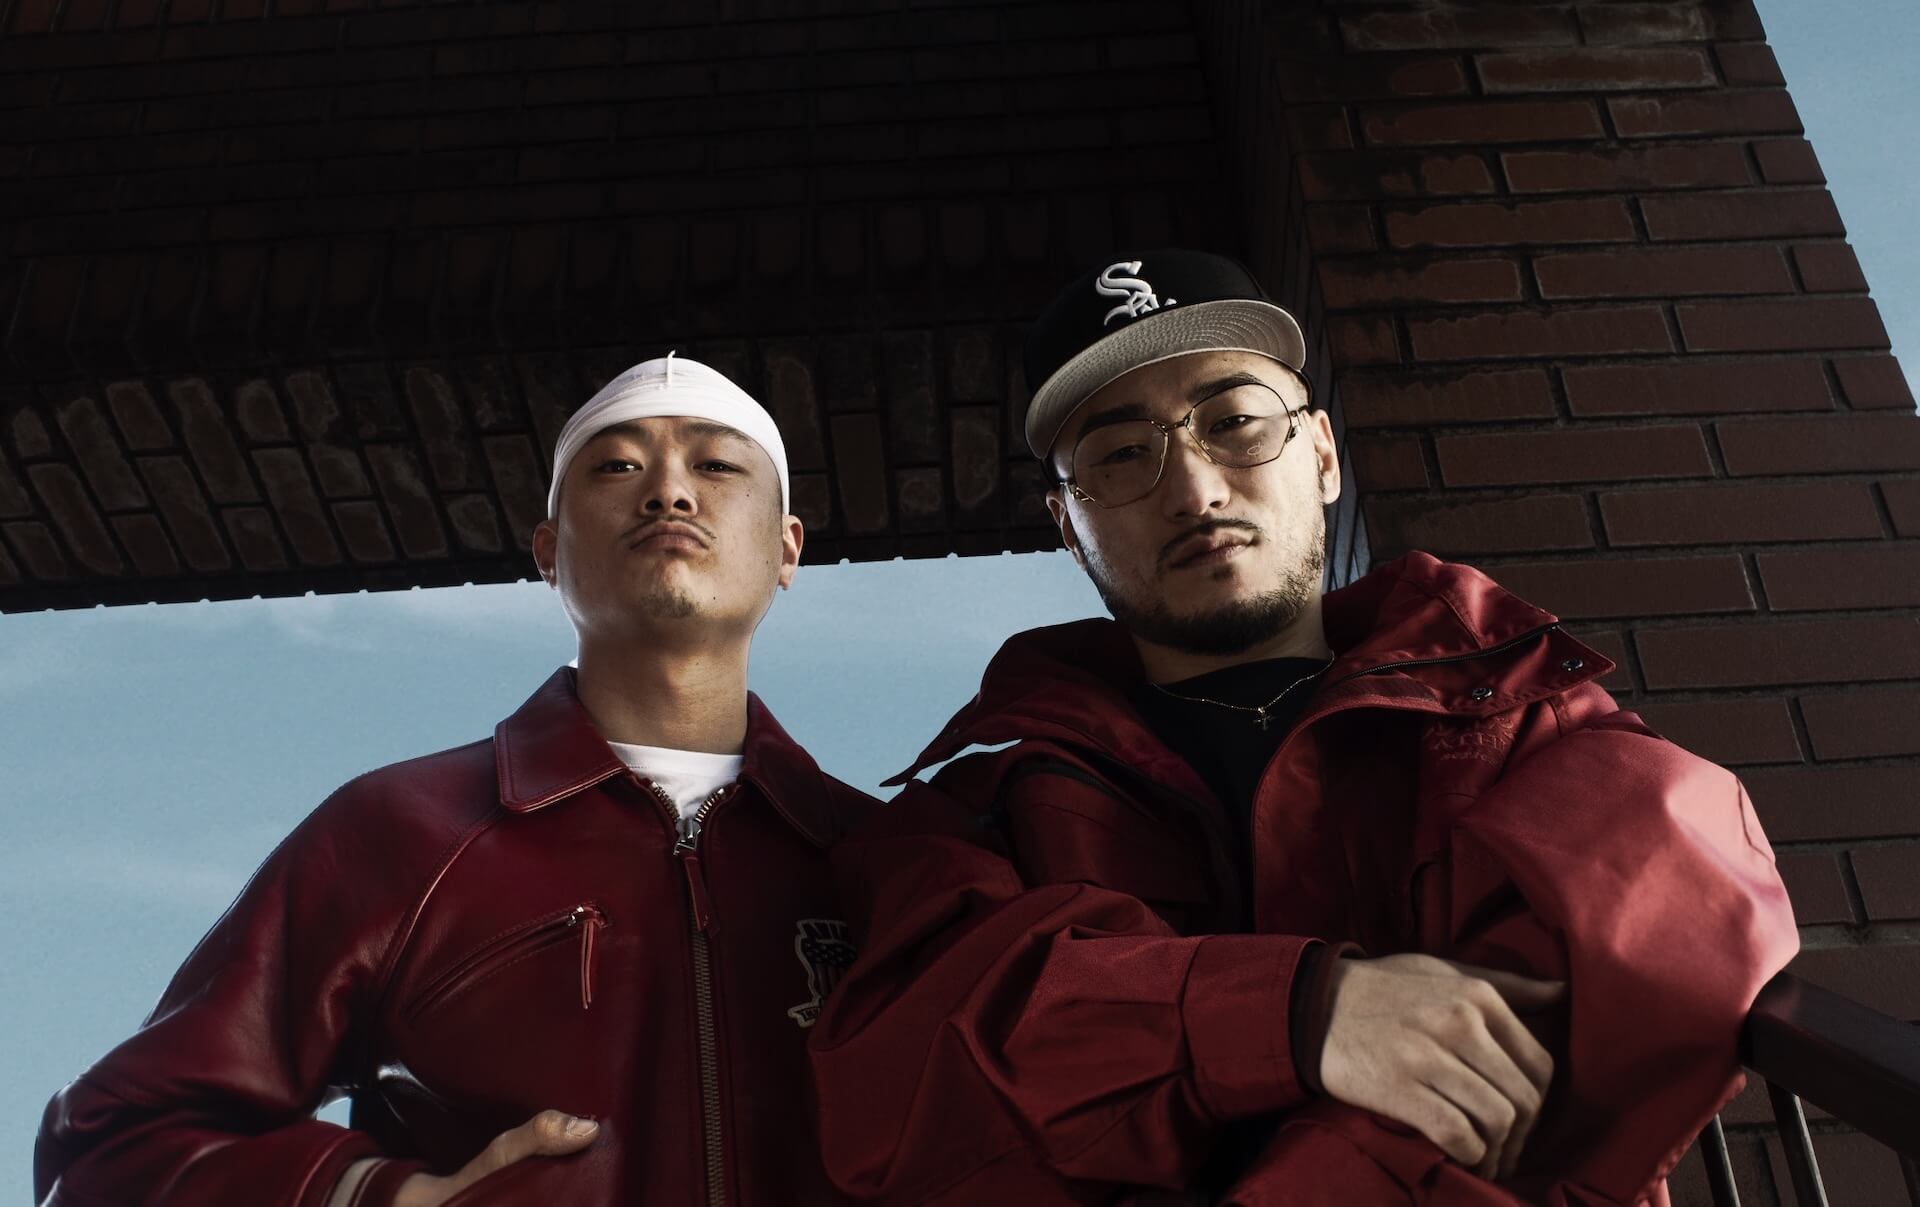 T2K a.k.a. Mr.TeeとGreedyによるタッグEP『Nostalzip』が本日リリース music210120-tsk-greedy-1